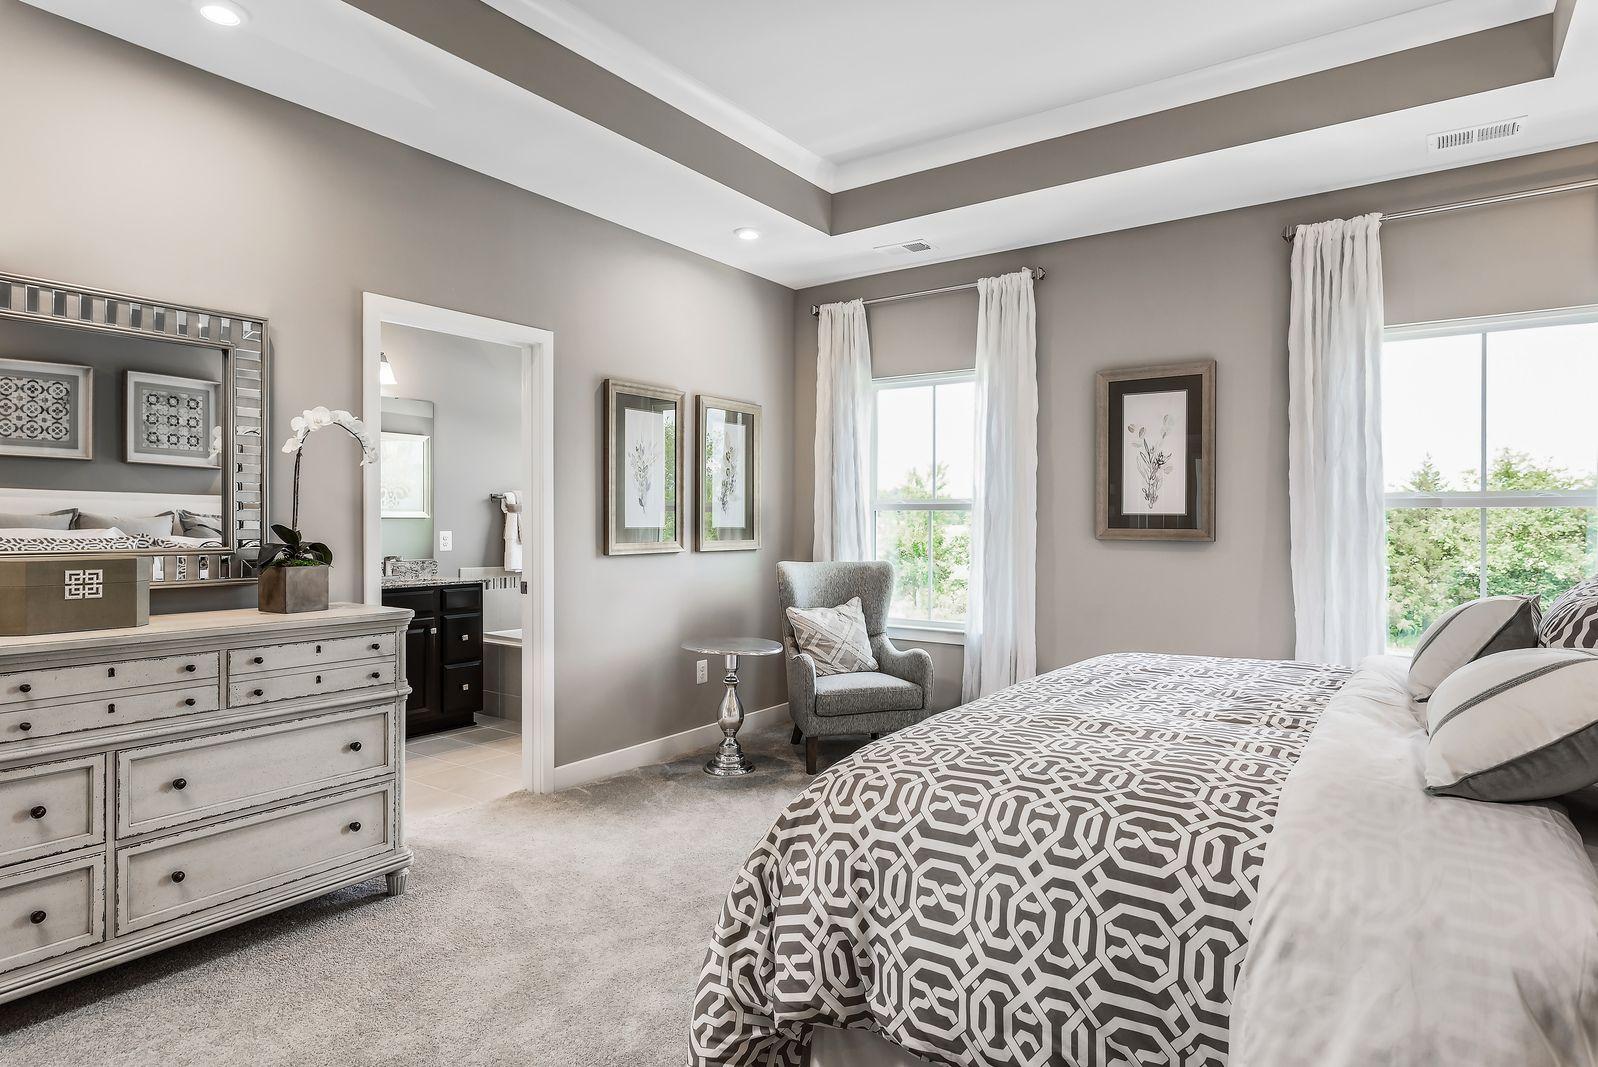 Bedroom featured in the Schubert By Ryan Homes in Morris County, NJ